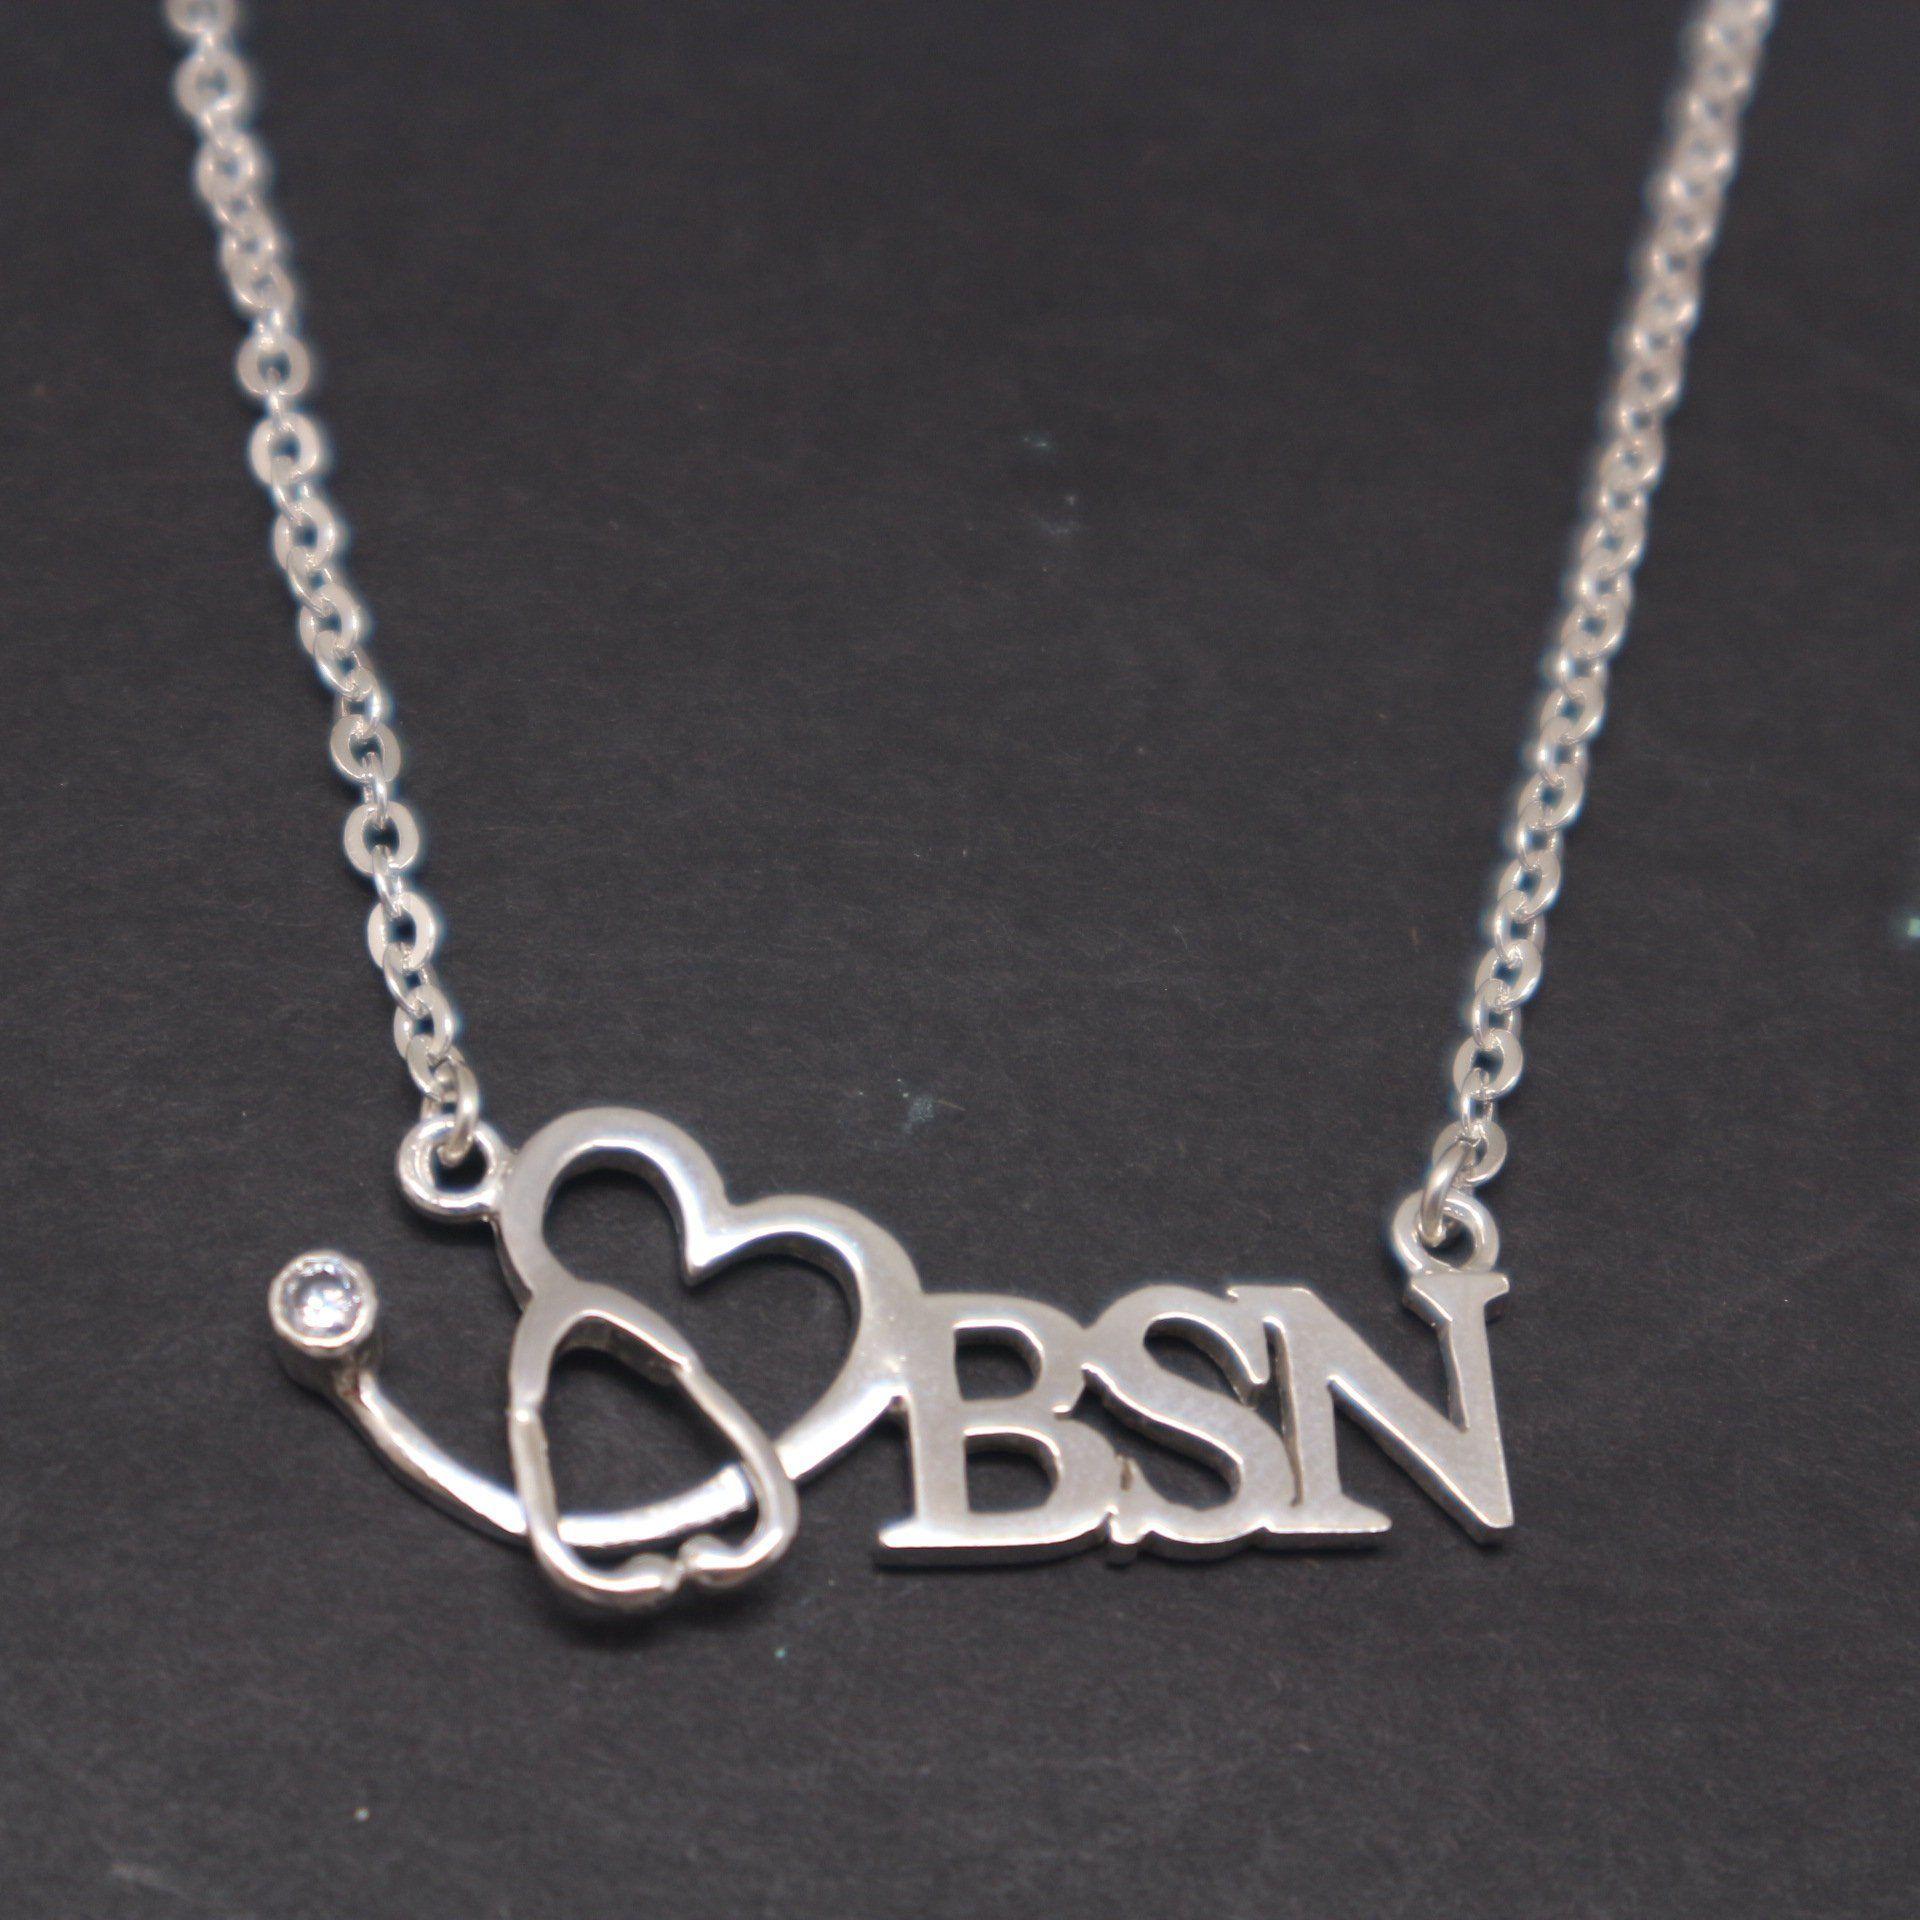 Bsn stethoscope necklace nurse practitioner nursing